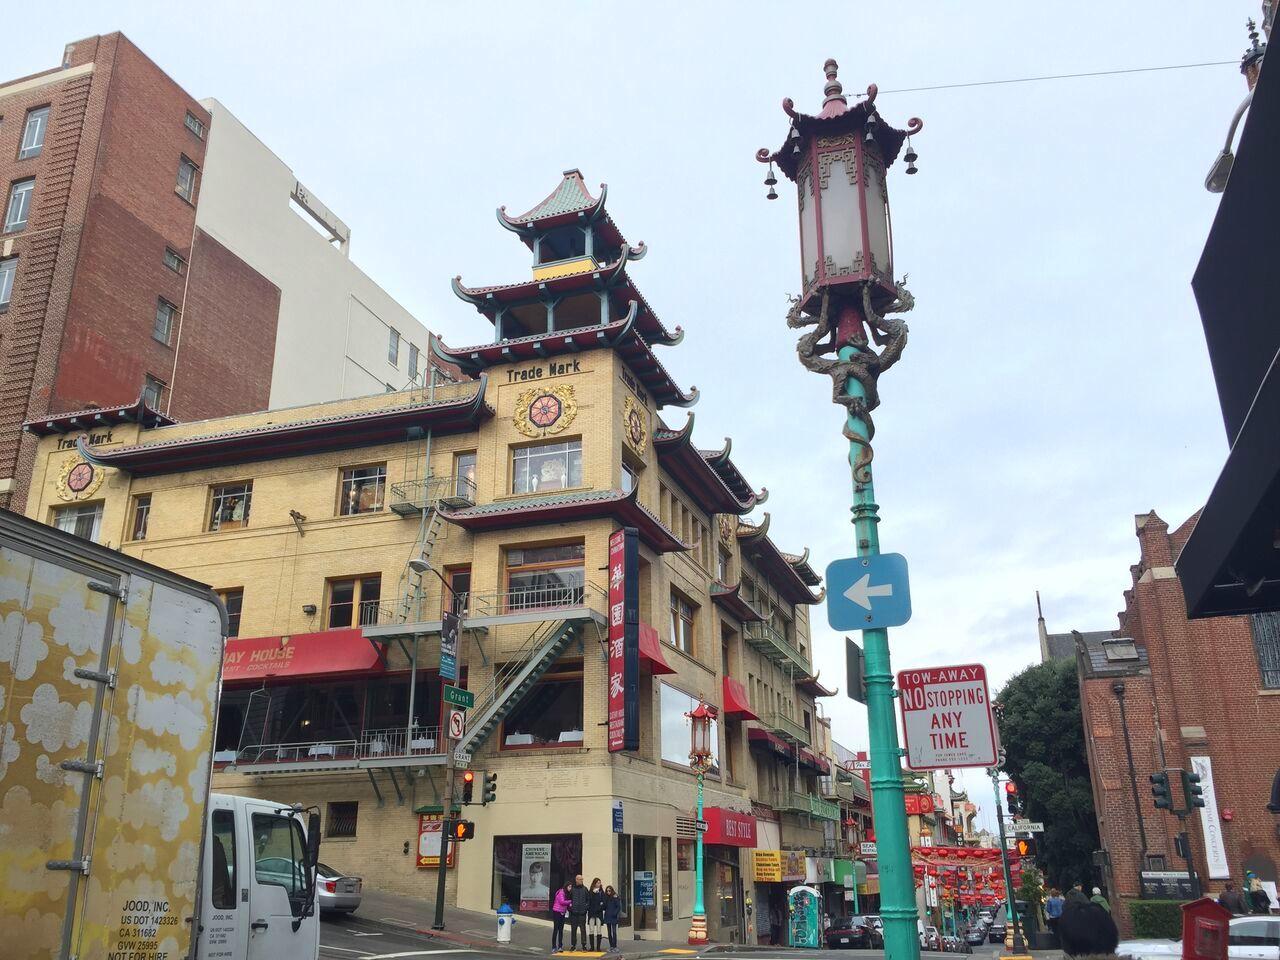 San Francisco舊金山自由行:漁人碼頭、中國城 Day 2